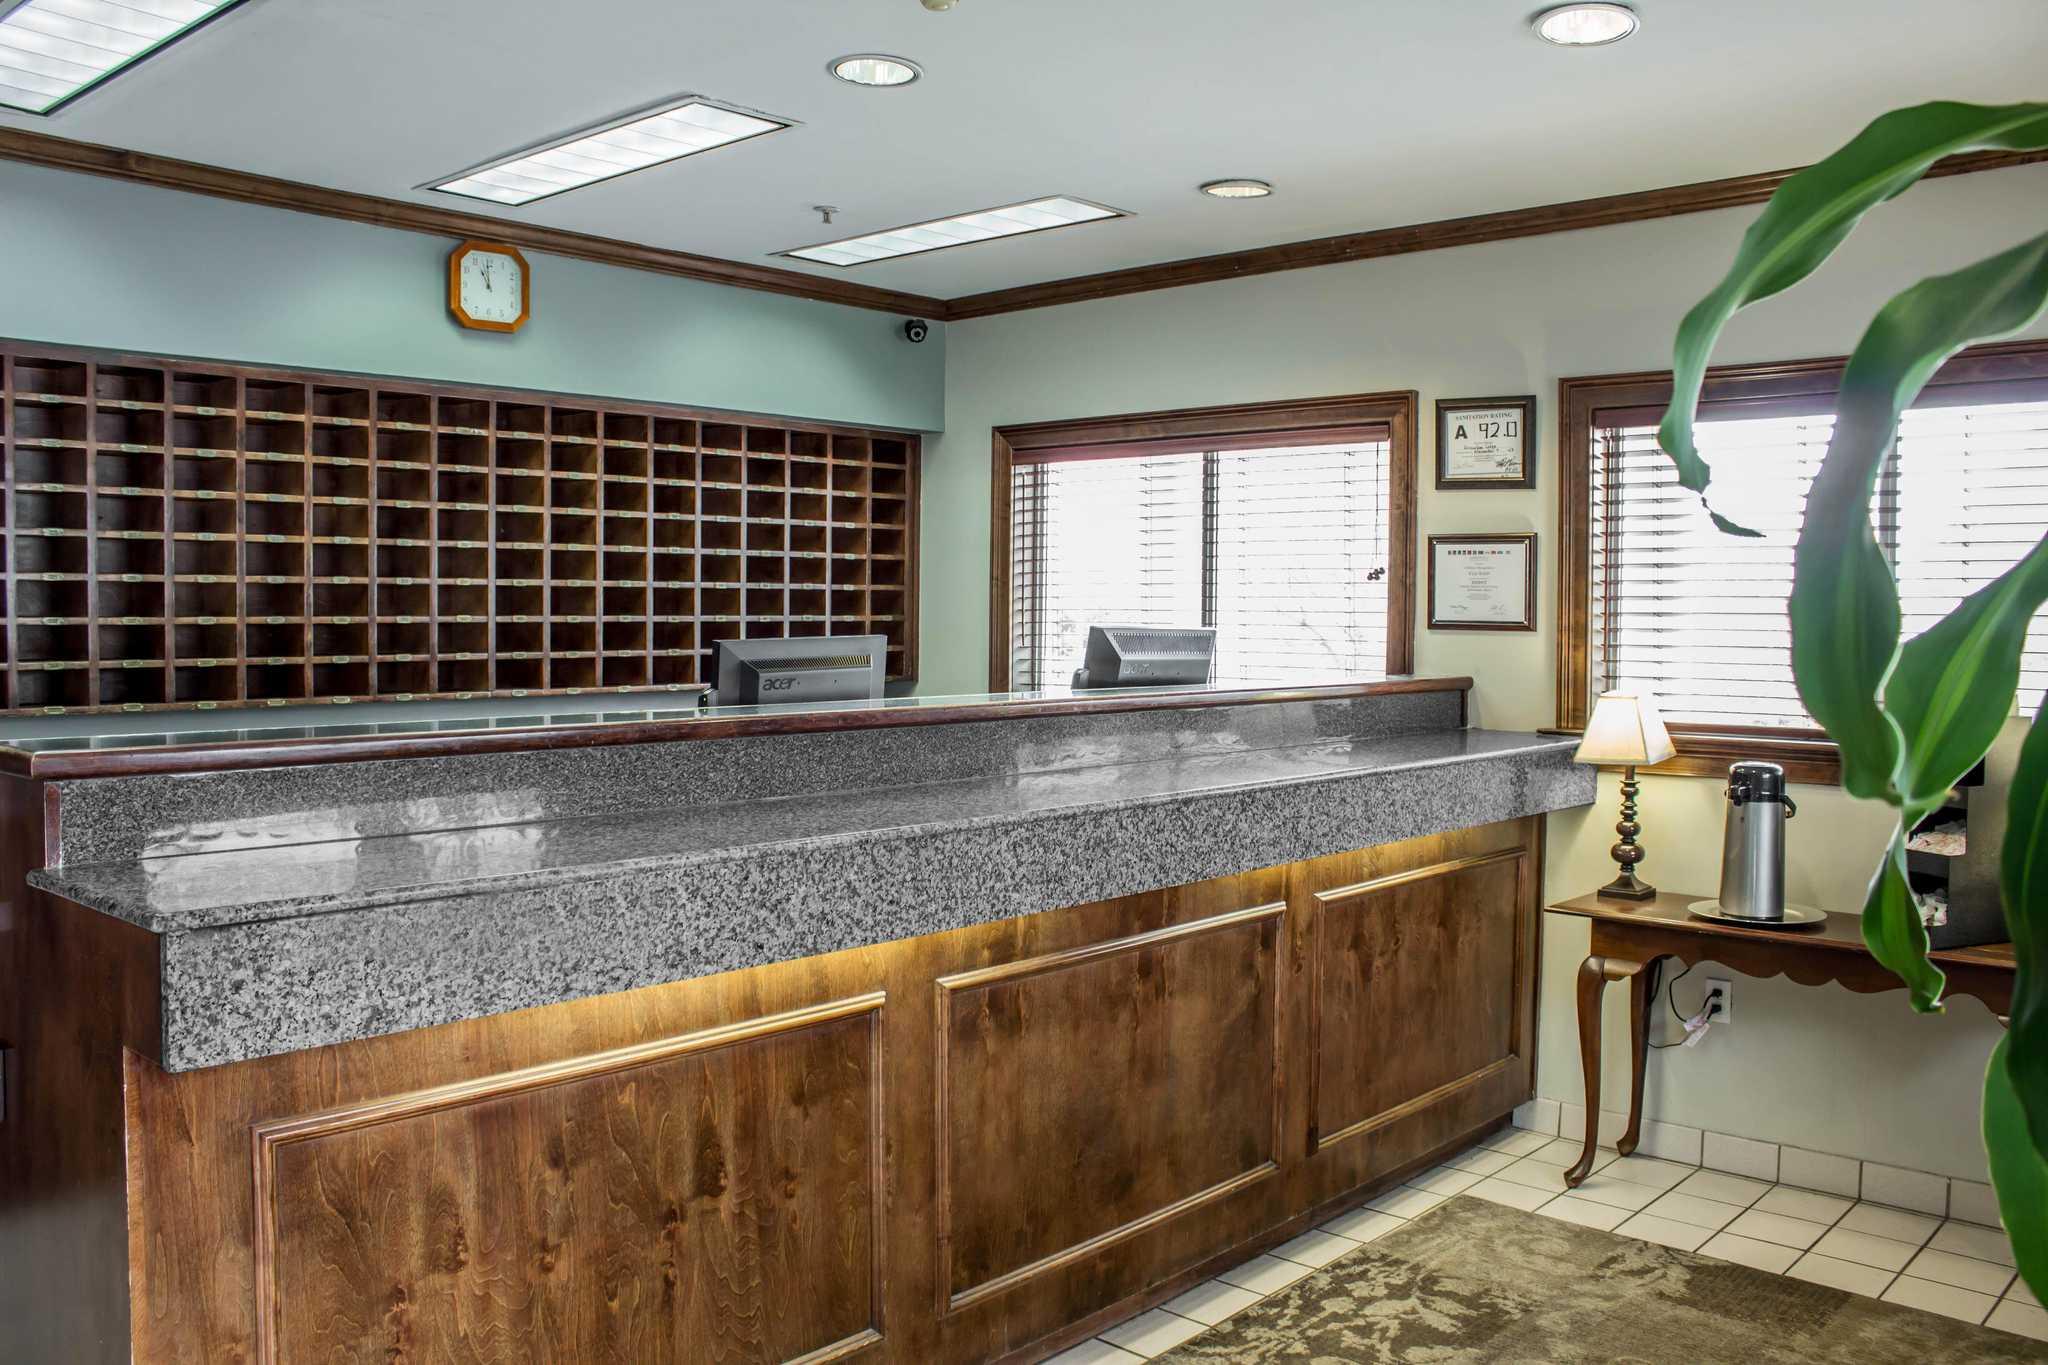 SpringHill Suites Greensboro Hotel - TripAdvisor